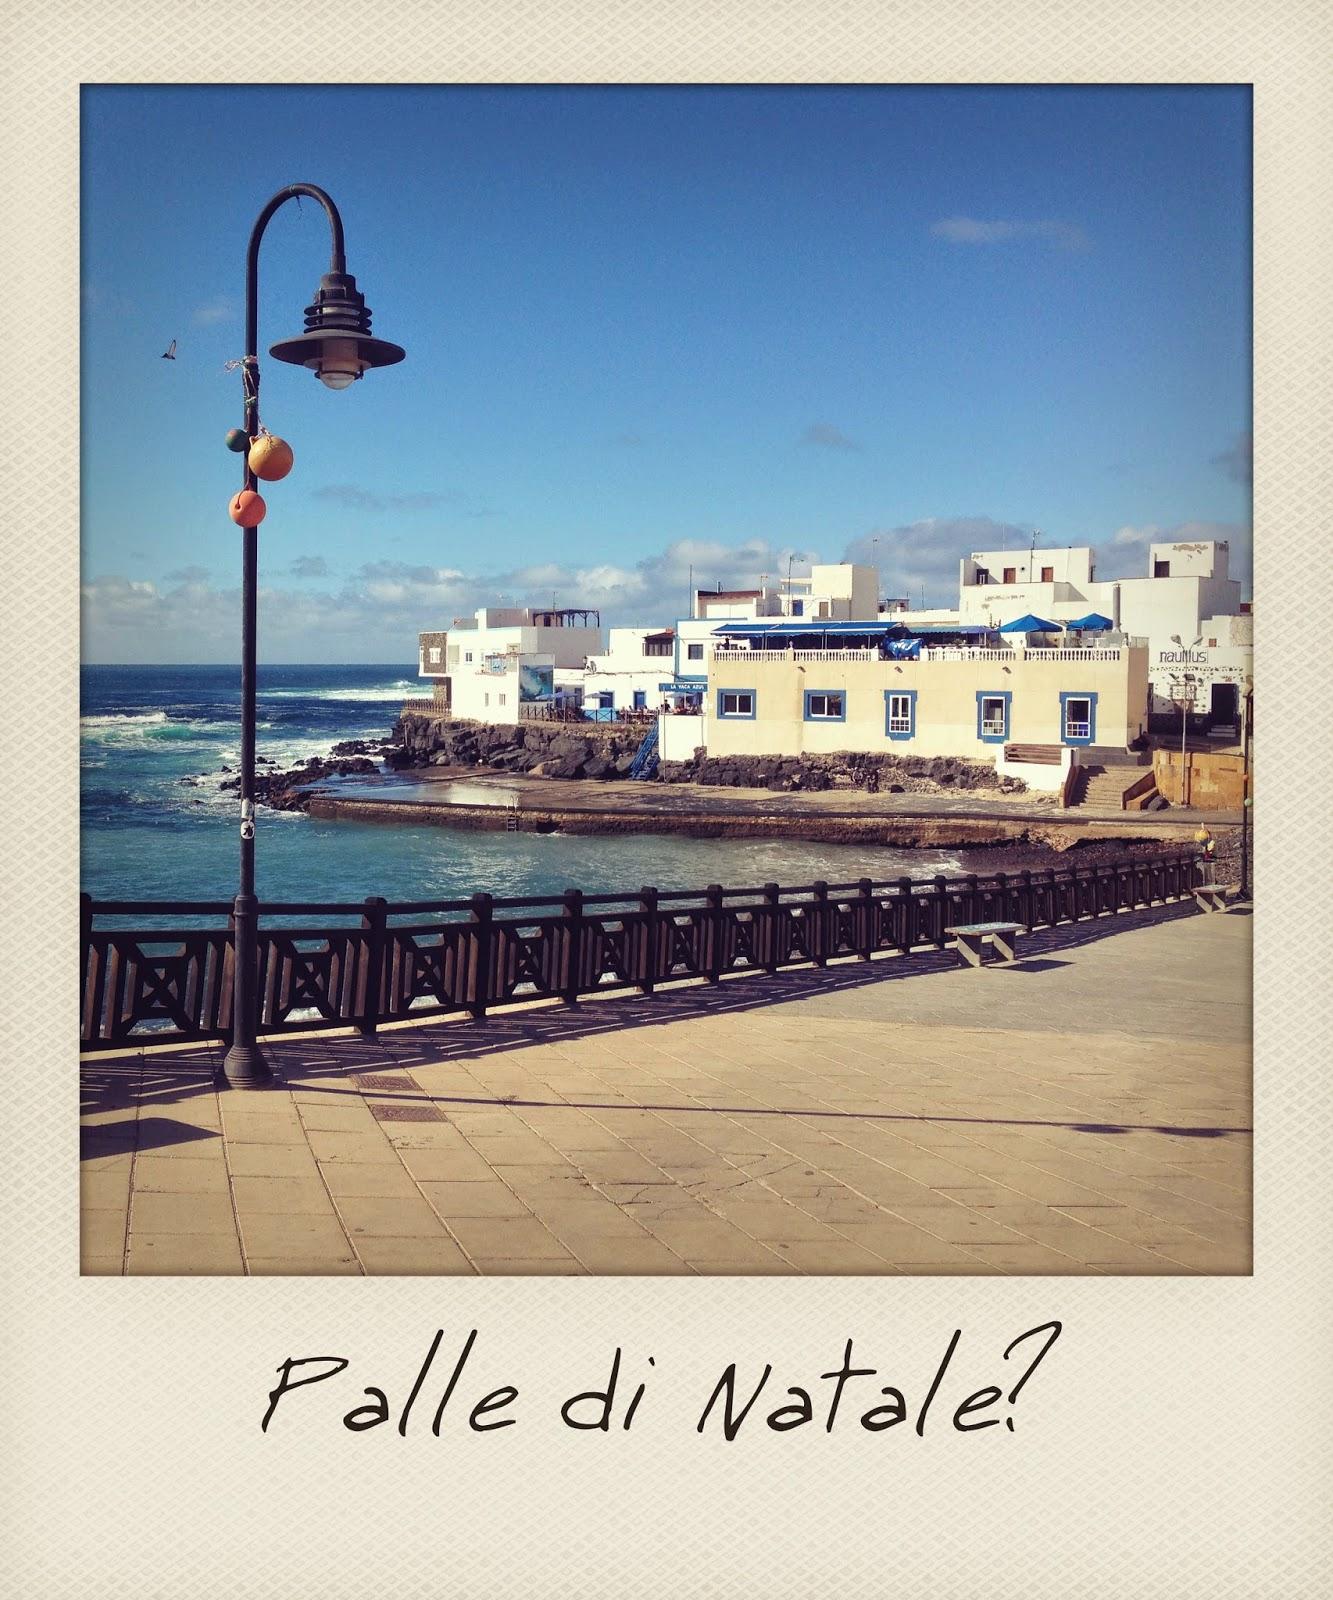 Canarie per famiglie - Fuerteventura